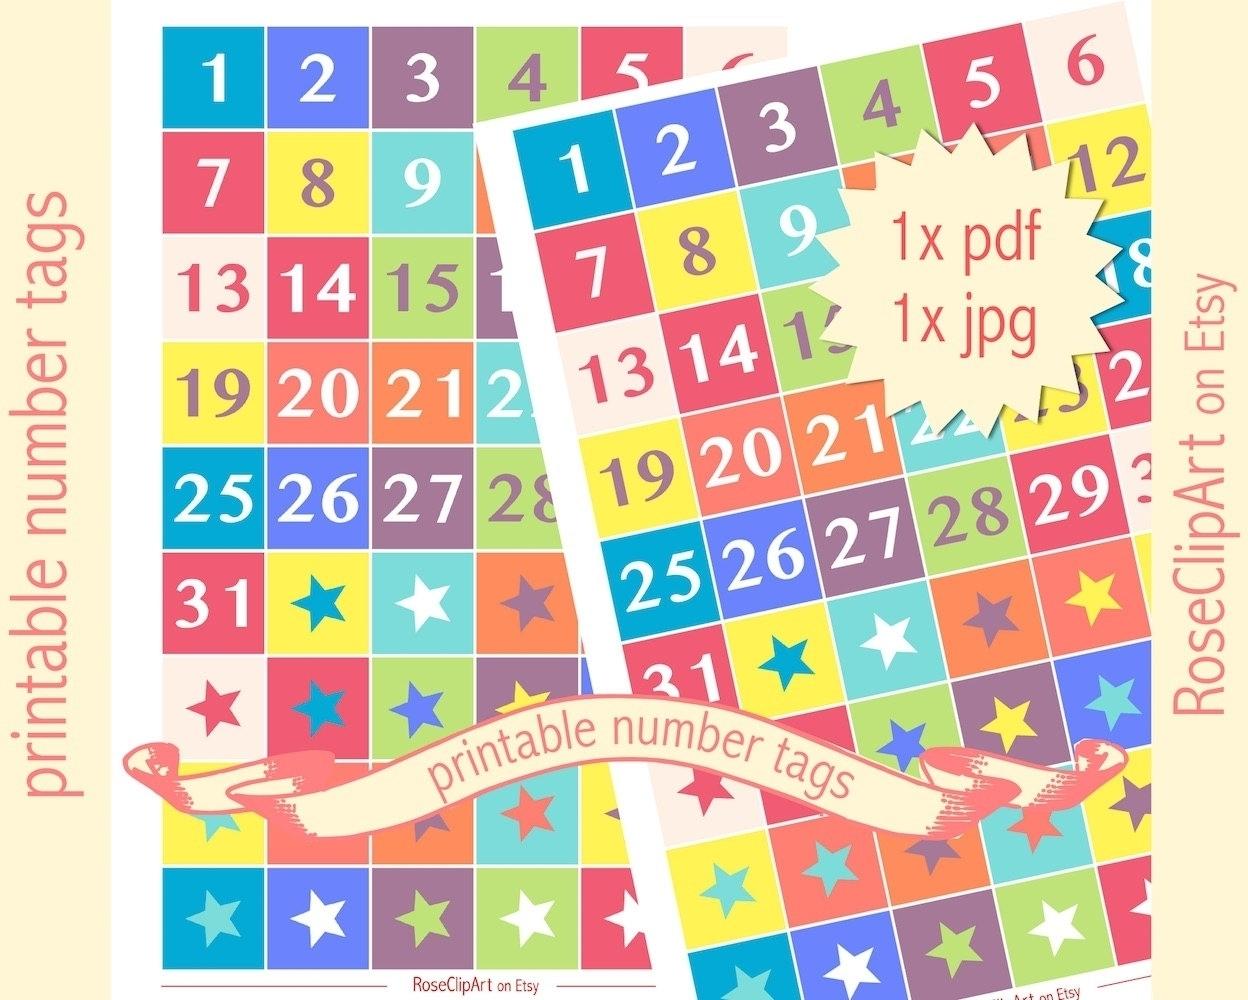 Printable Numbers Up To 31 | Ten Free Printable Calendar 2020-2021